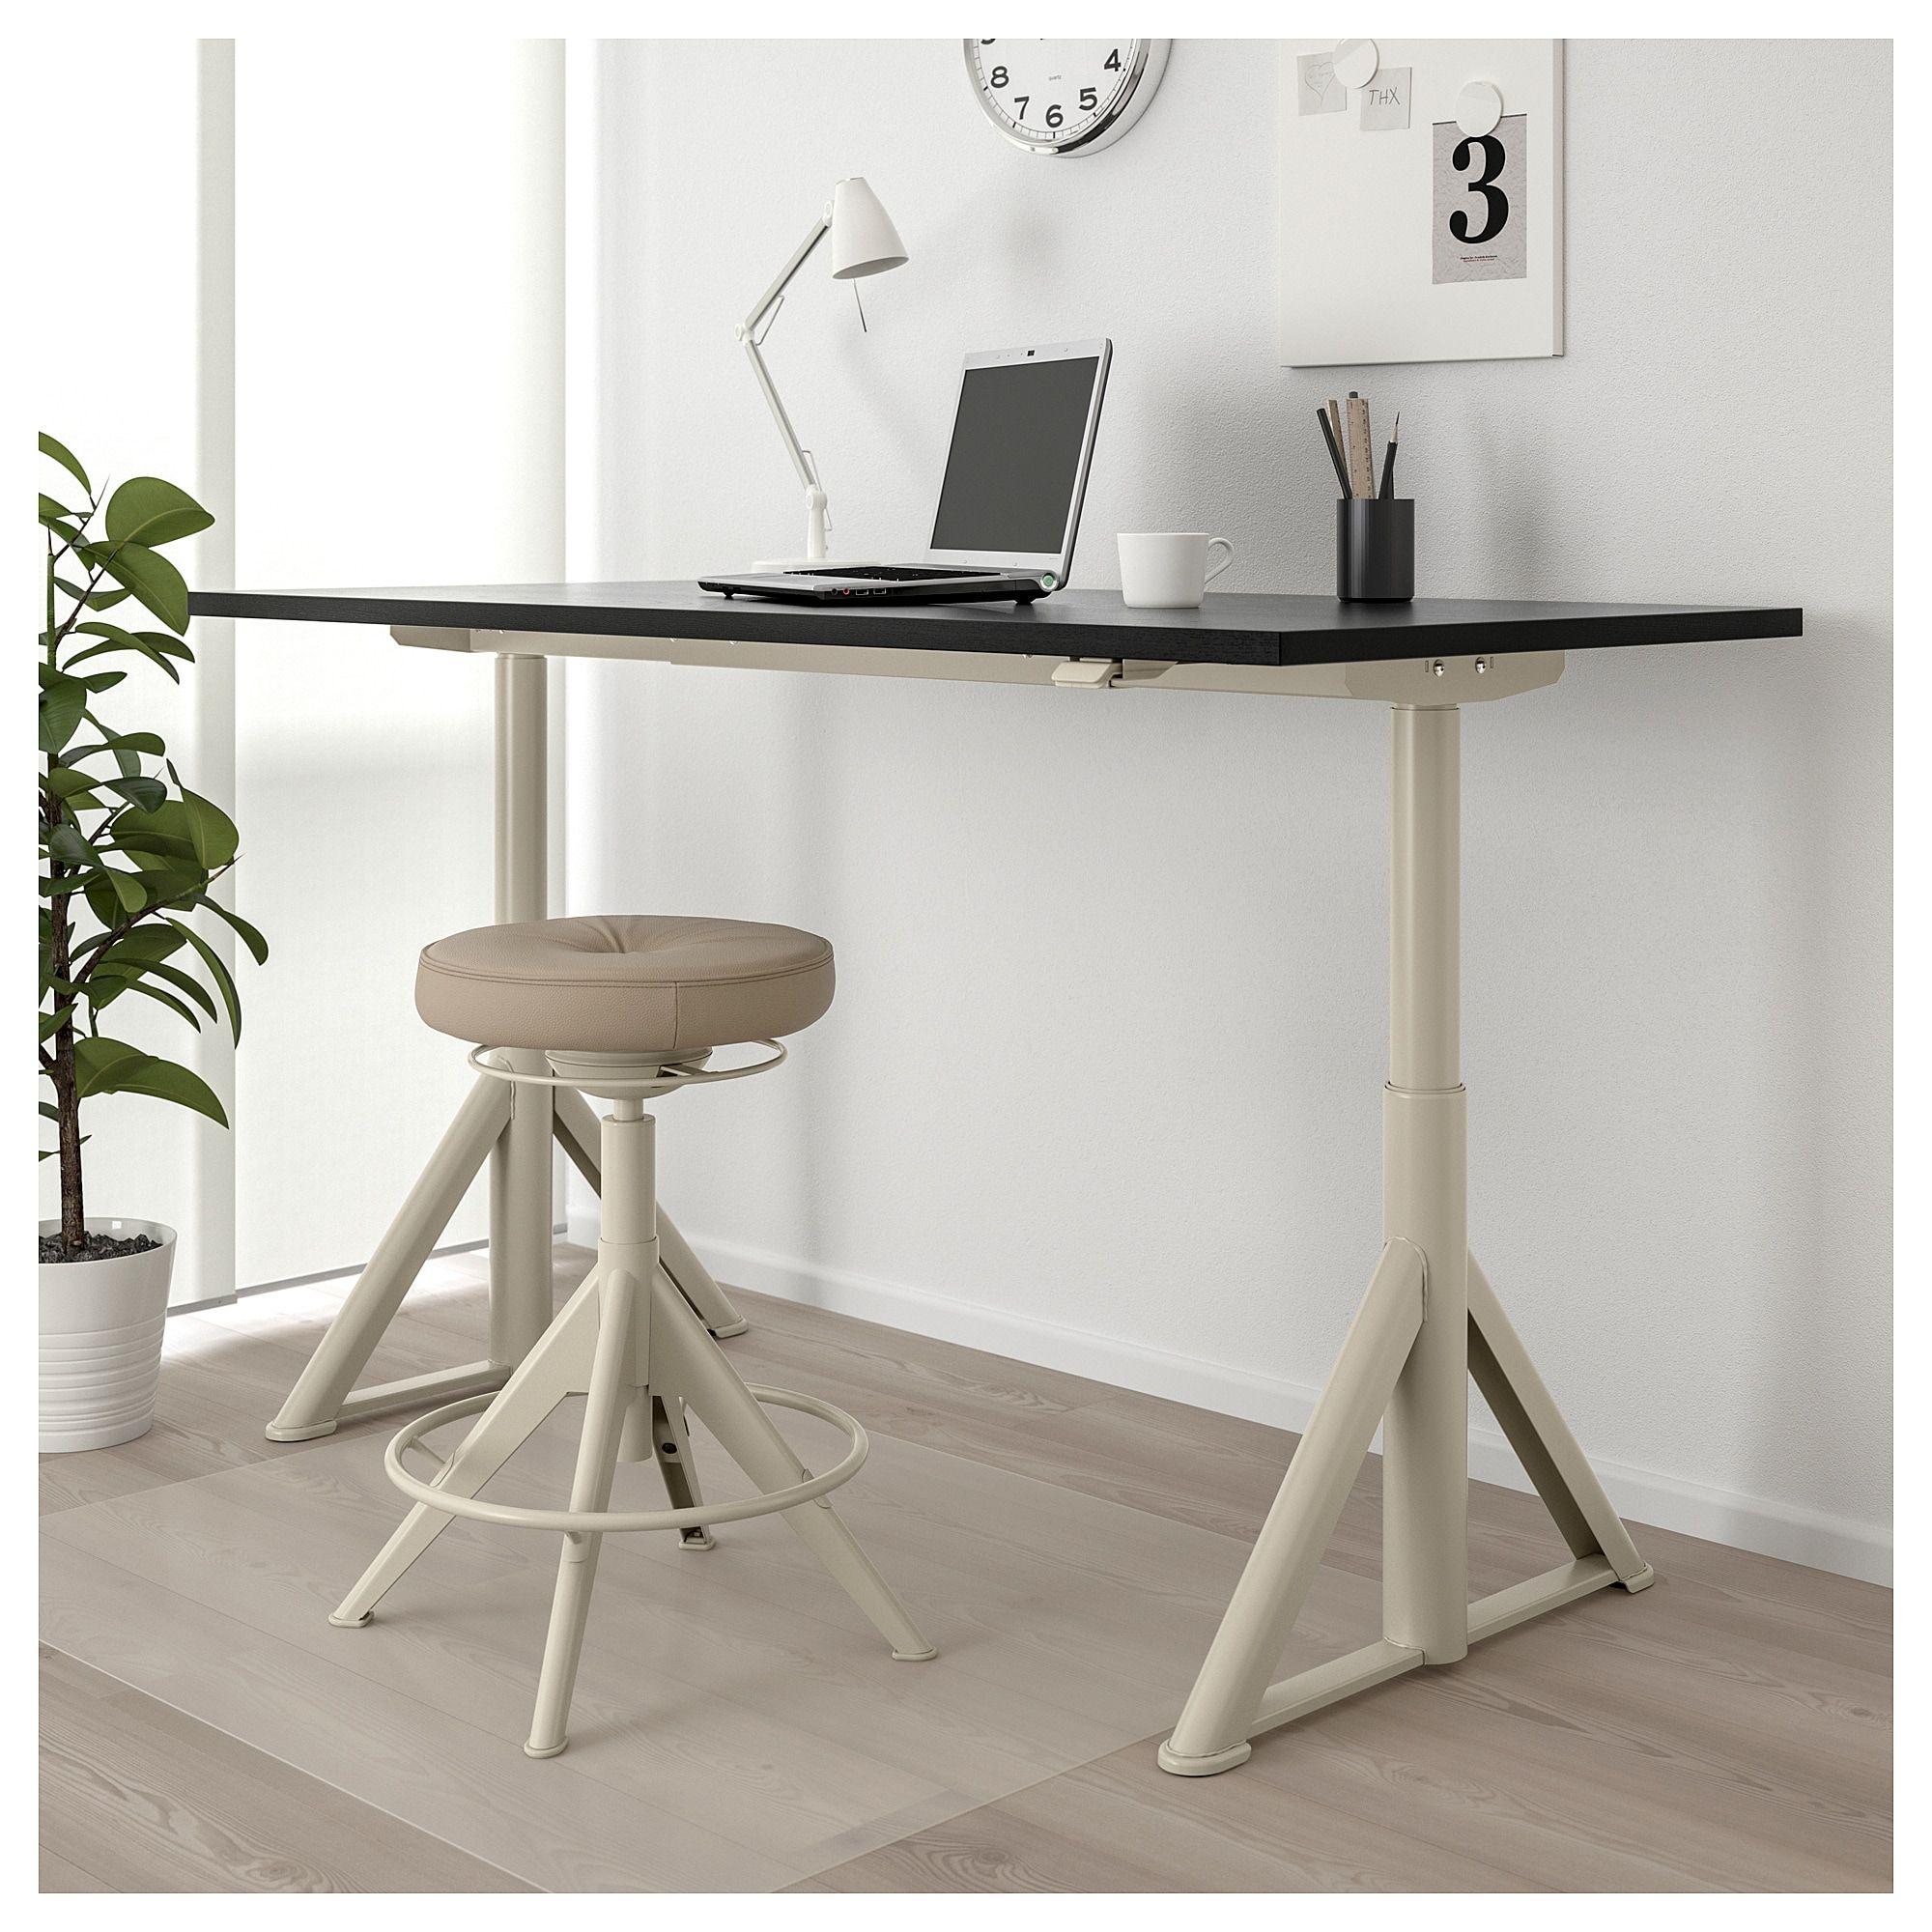 Ikea Idasen Black Beige Desk Sitstand Products In 2019